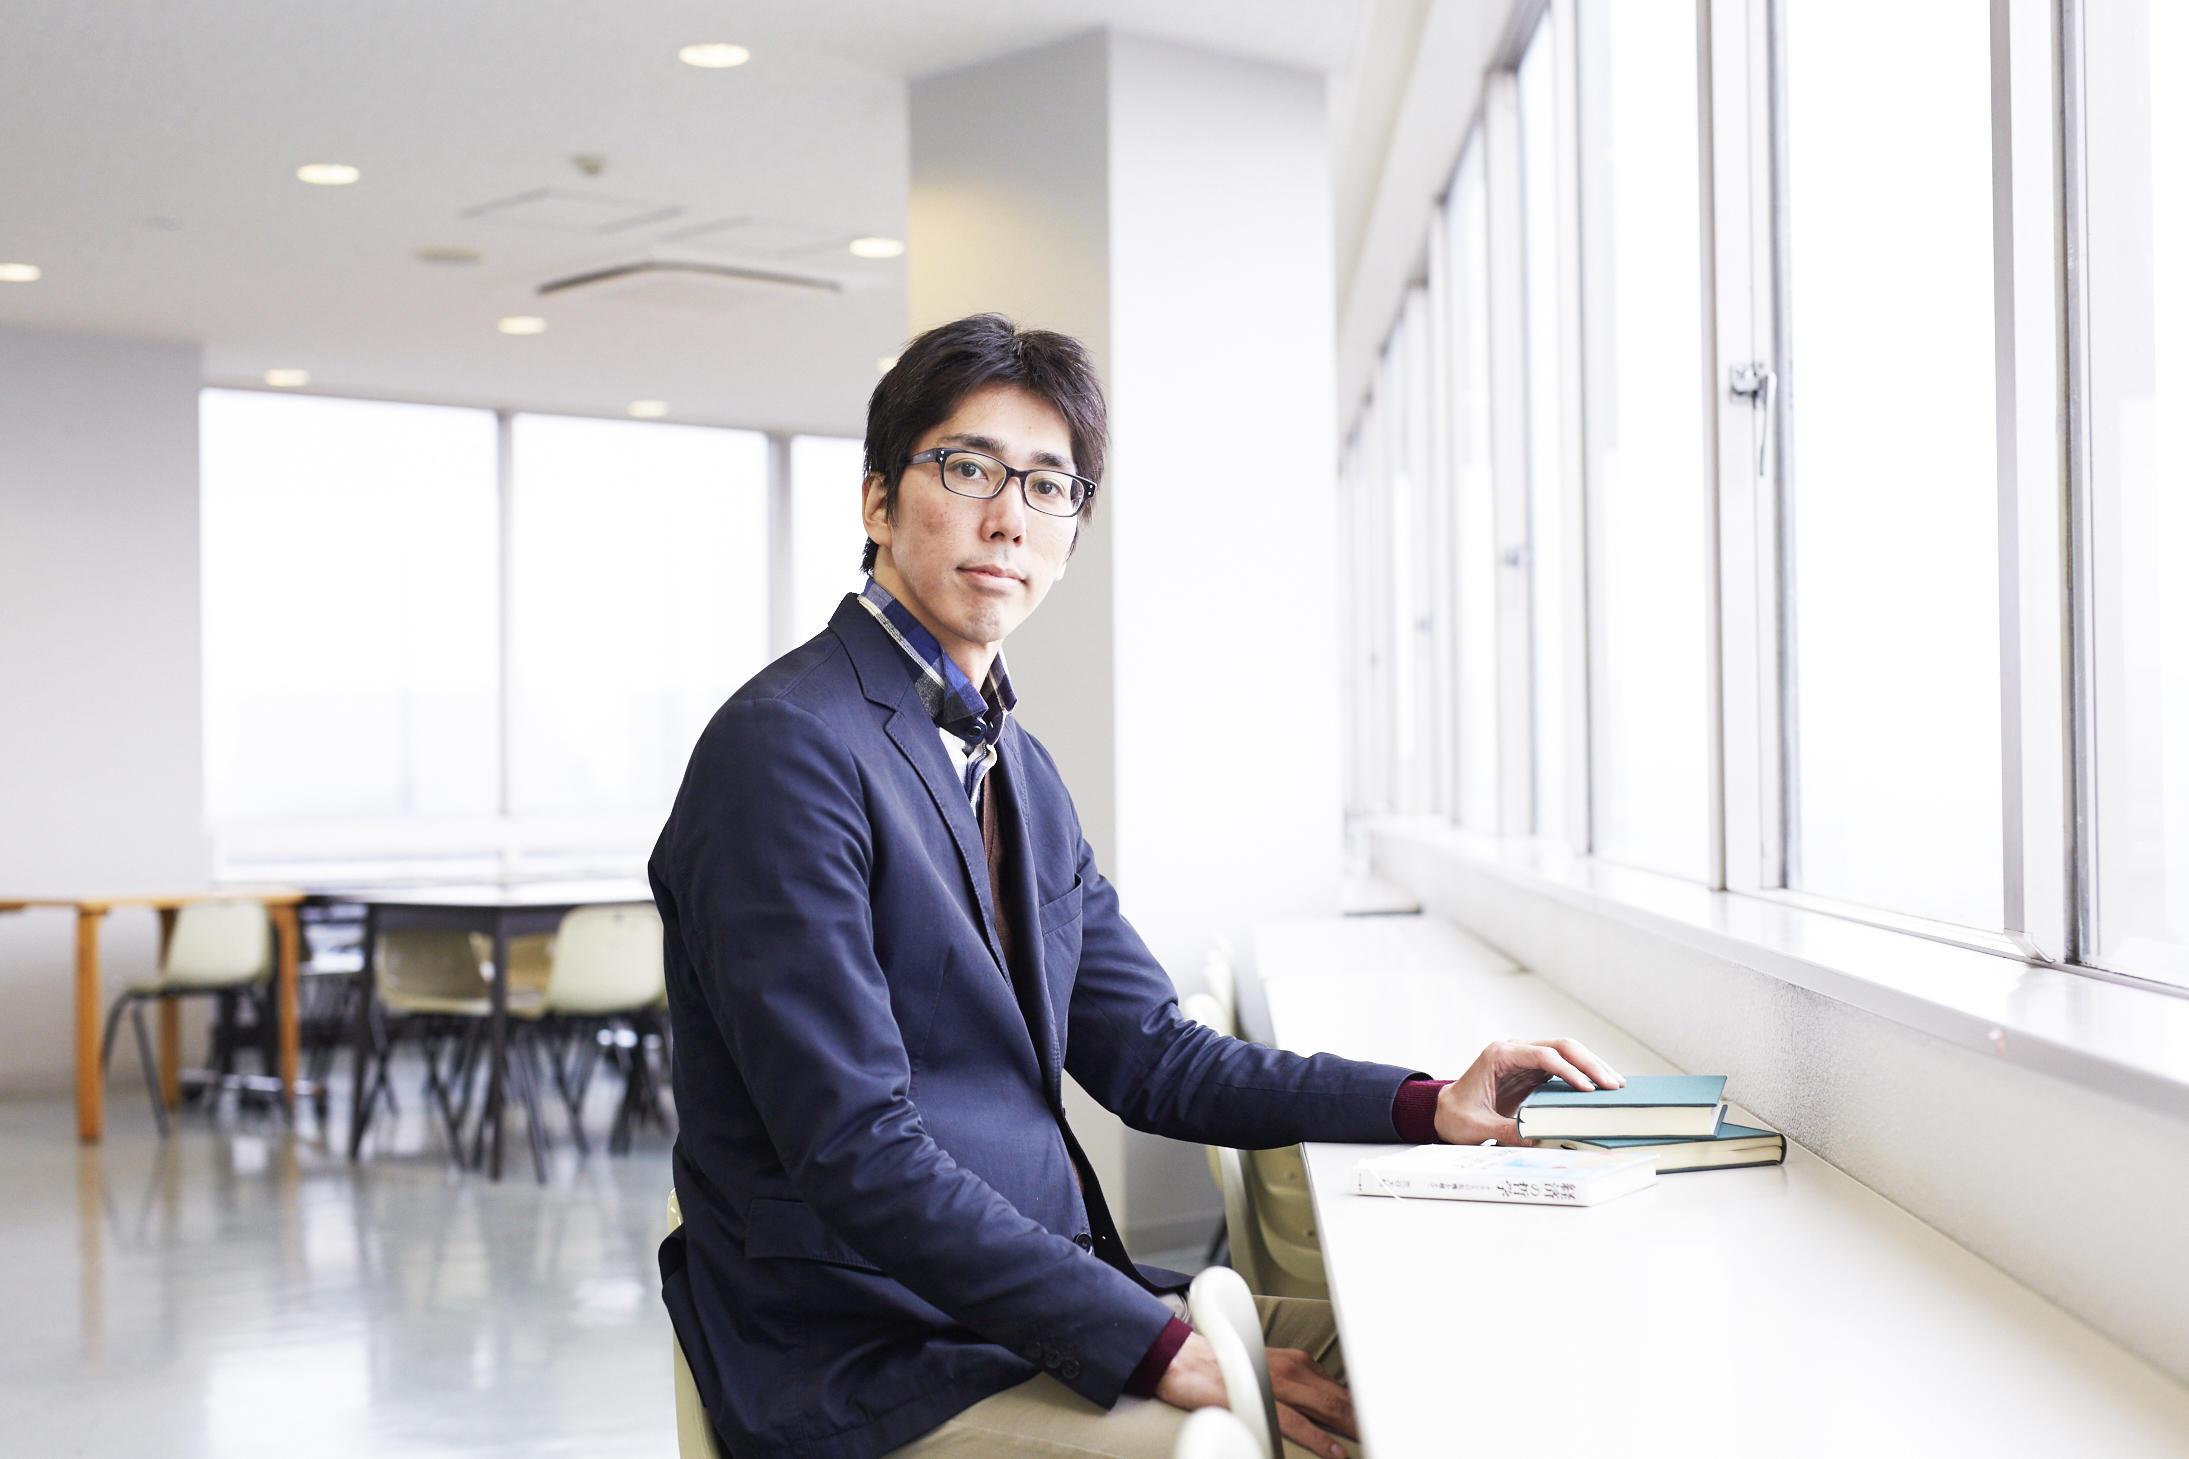 日本文藝家協会が江戸川大学基礎・教養教育センター長の荒谷大輔教授を会員に推薦